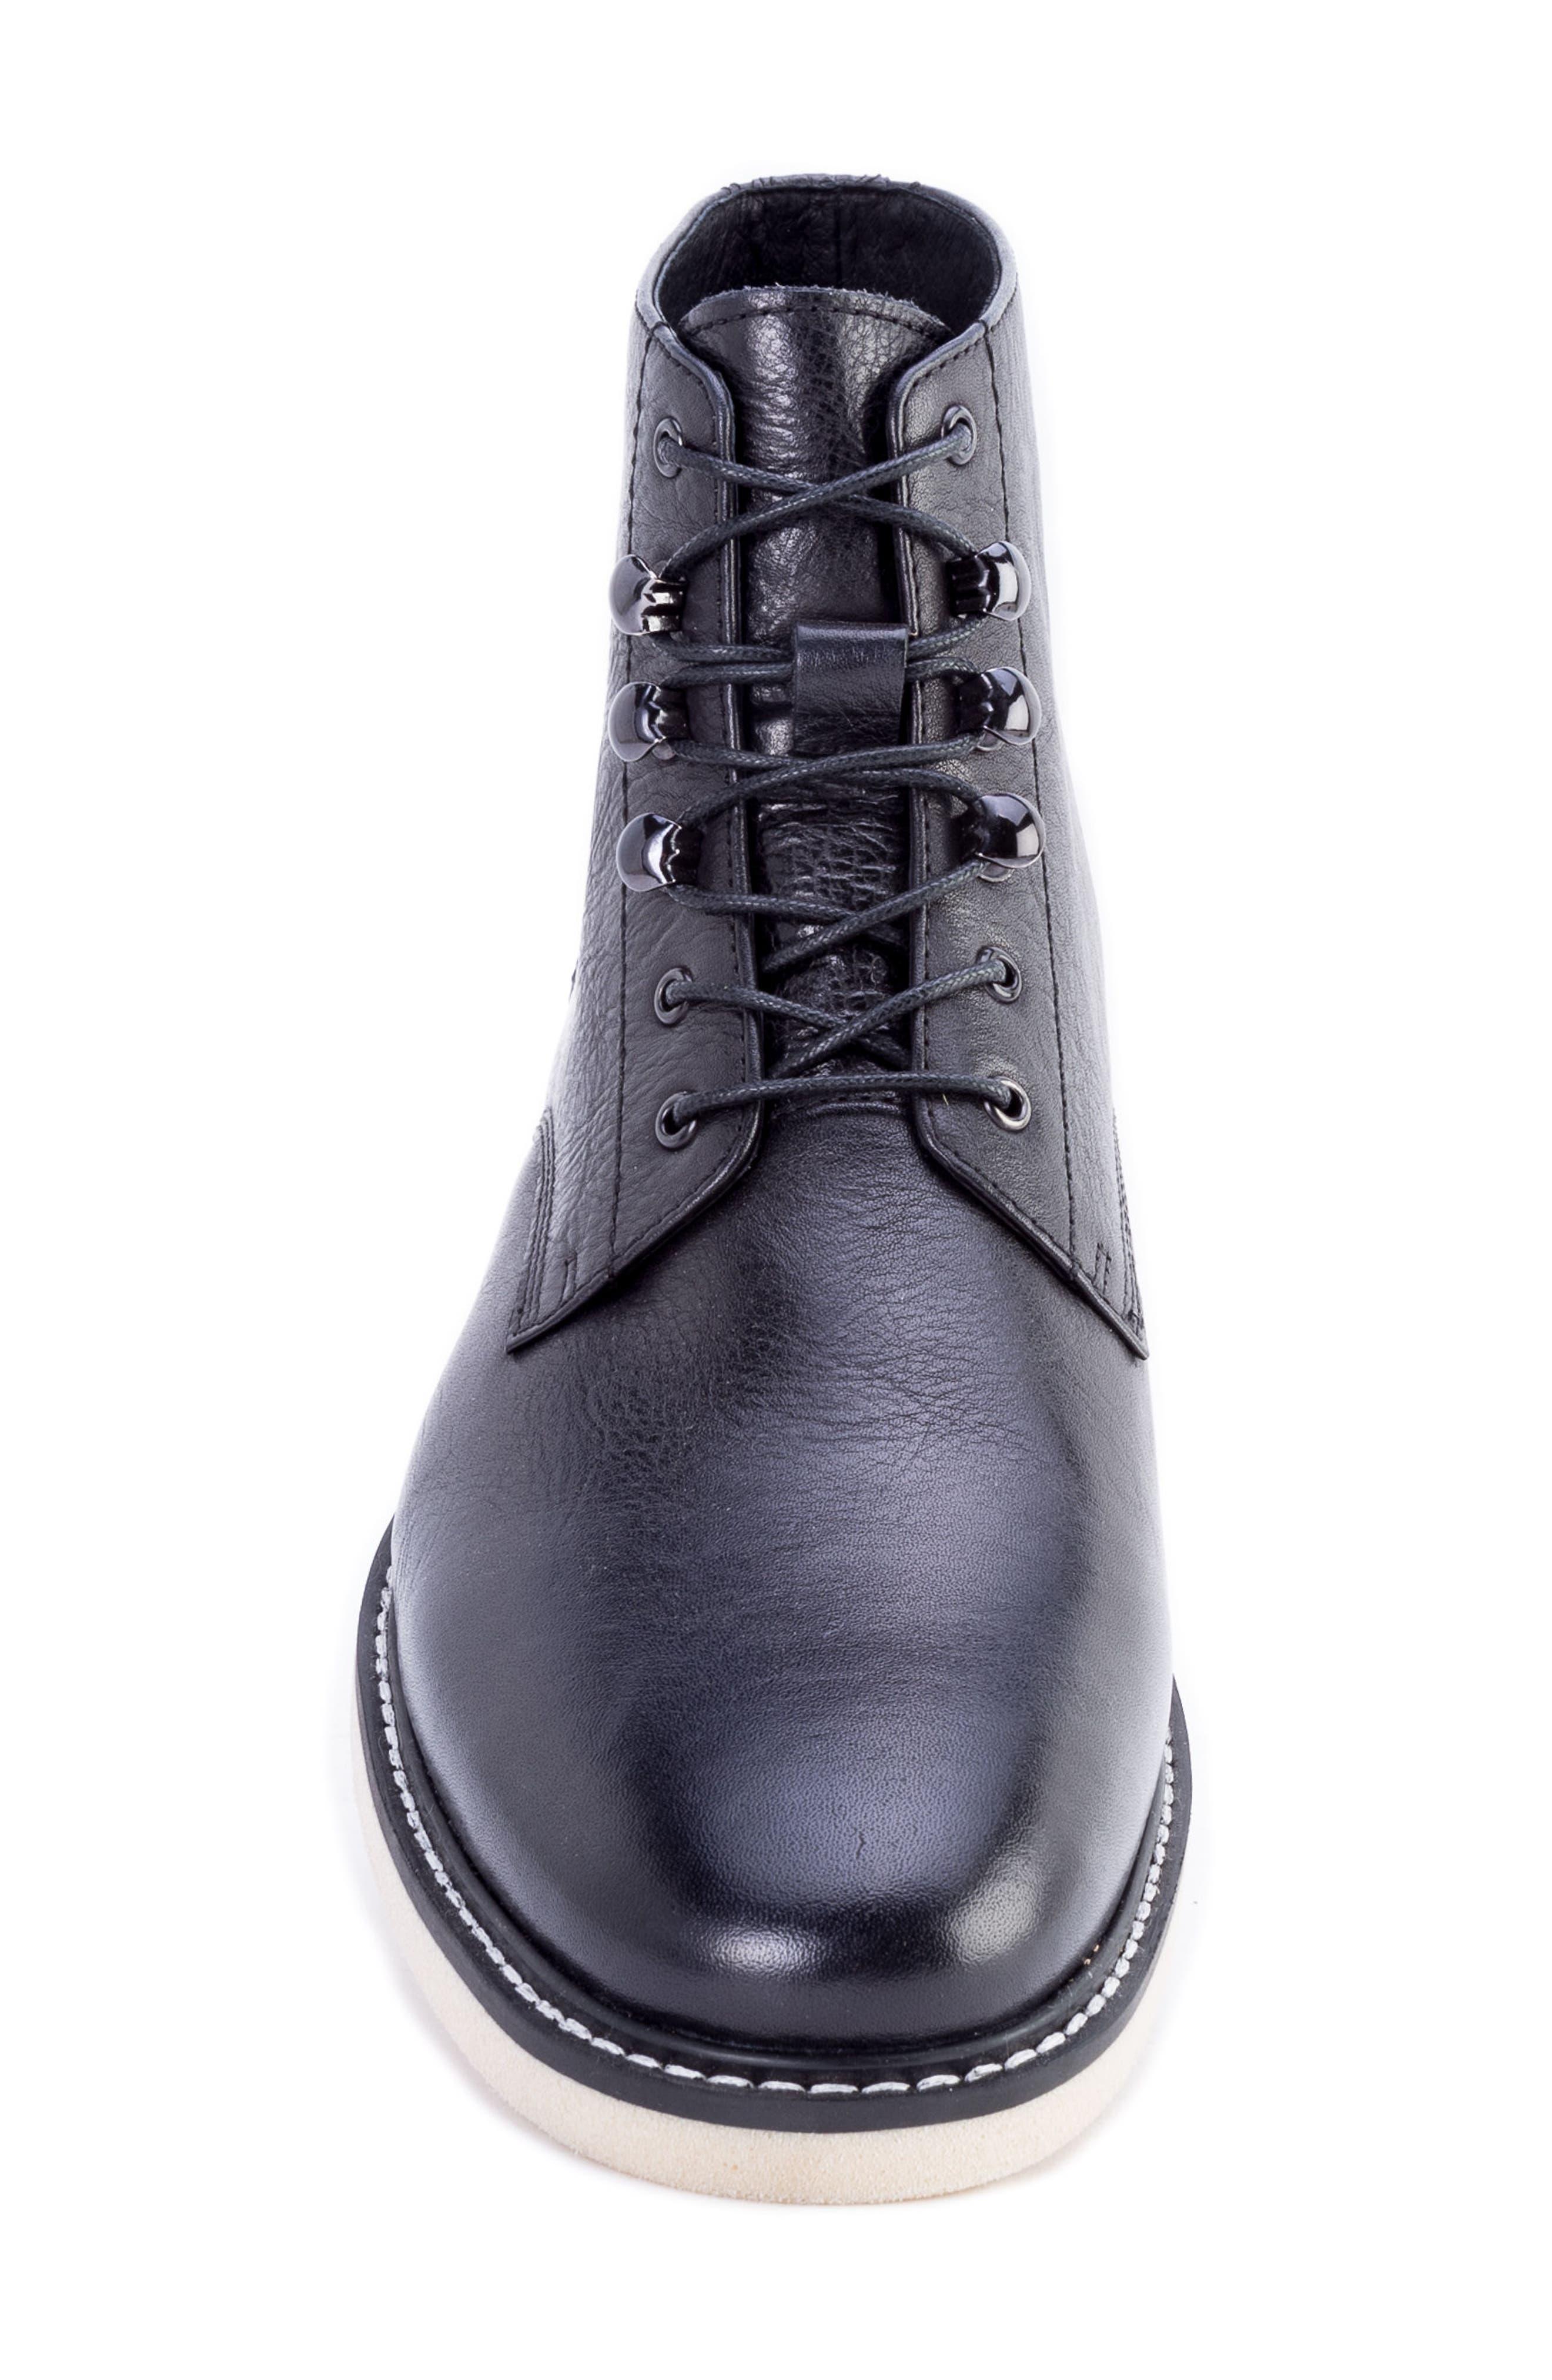 Finch Plain Toe Boot,                             Alternate thumbnail 5, color,                             BLACK LEATHER